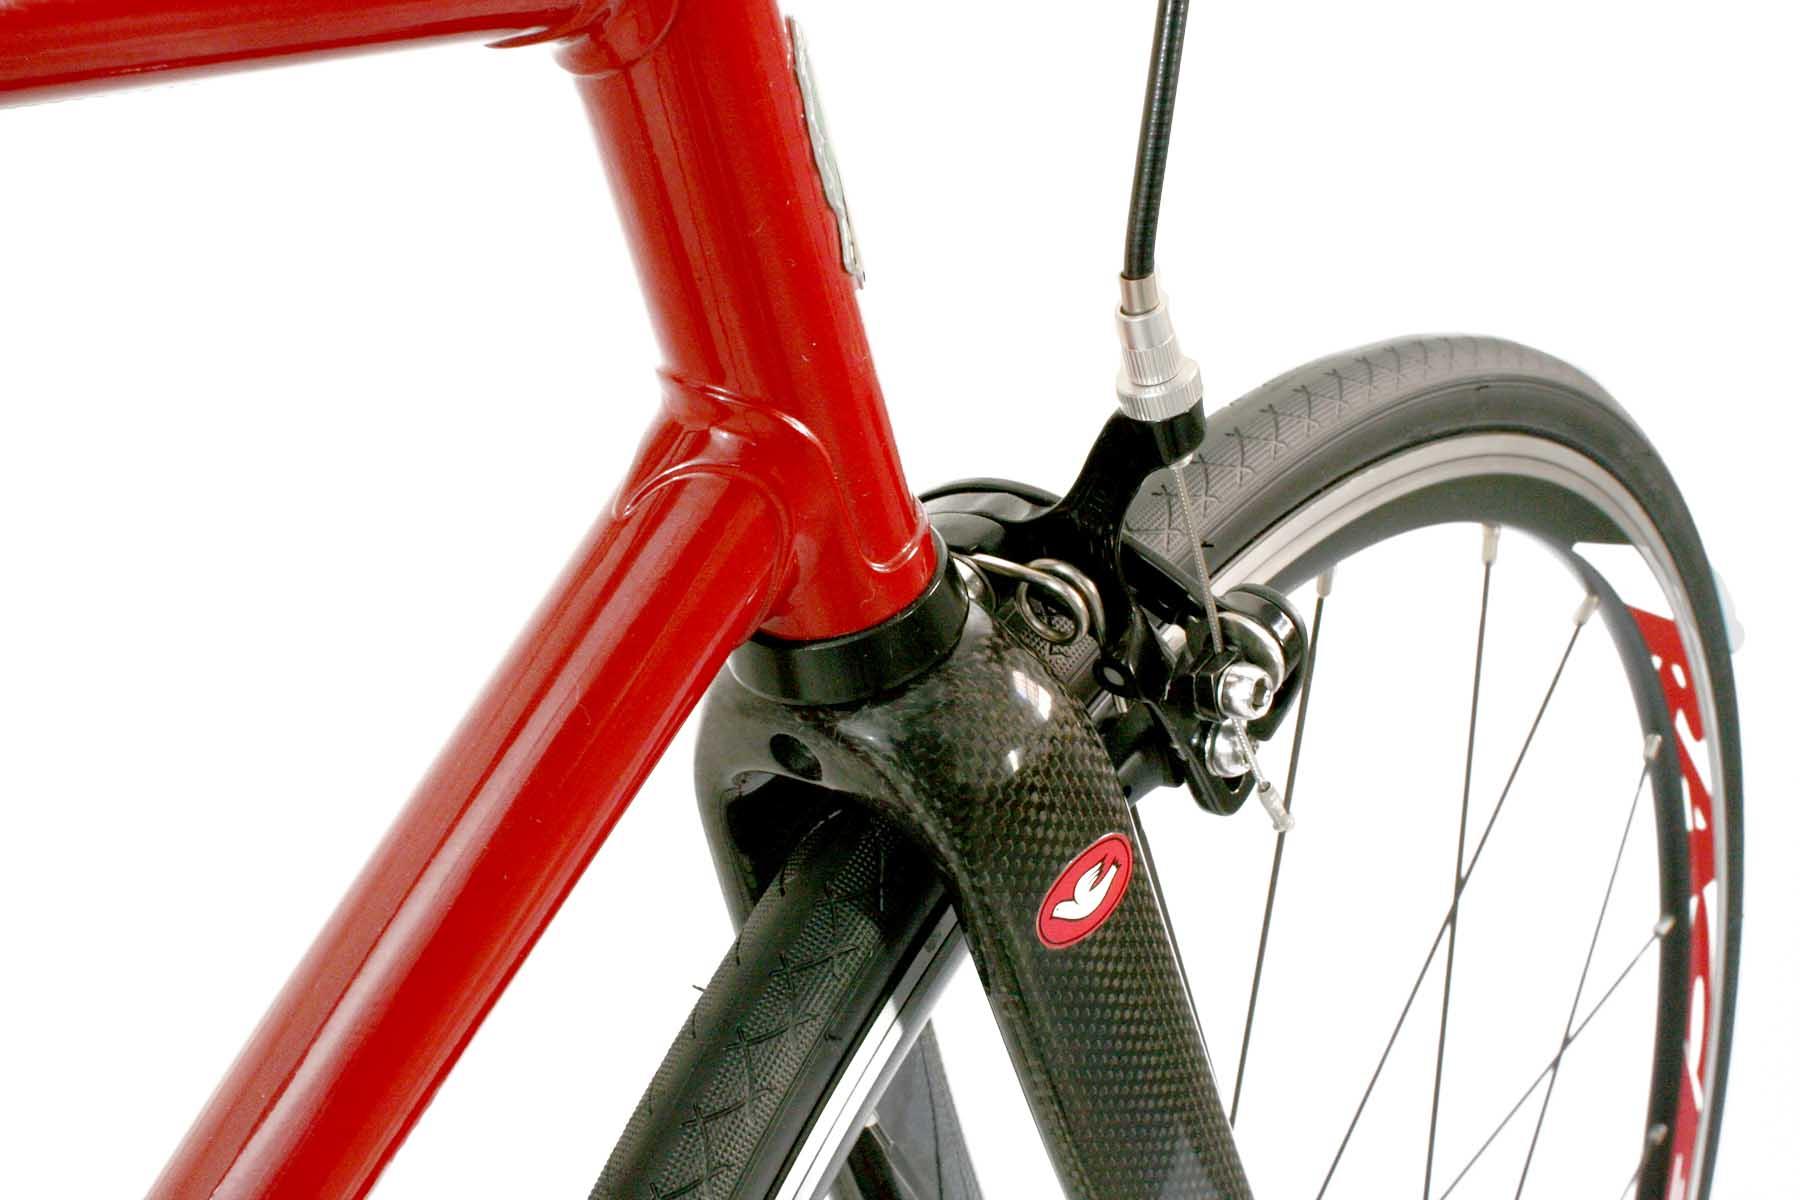 The New Iride Track Bike Fixed Gear Fixie Or Pista